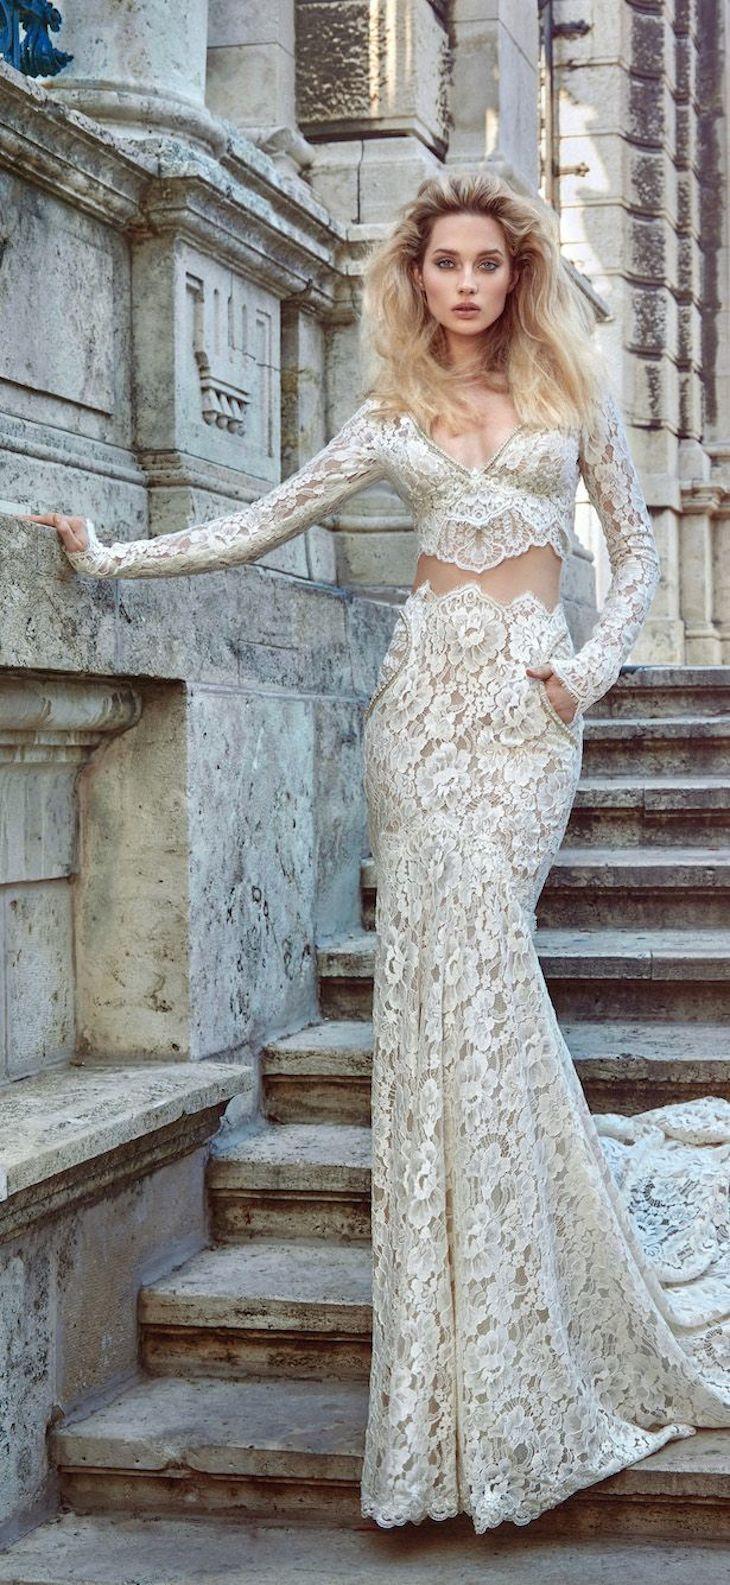 2-part-dress